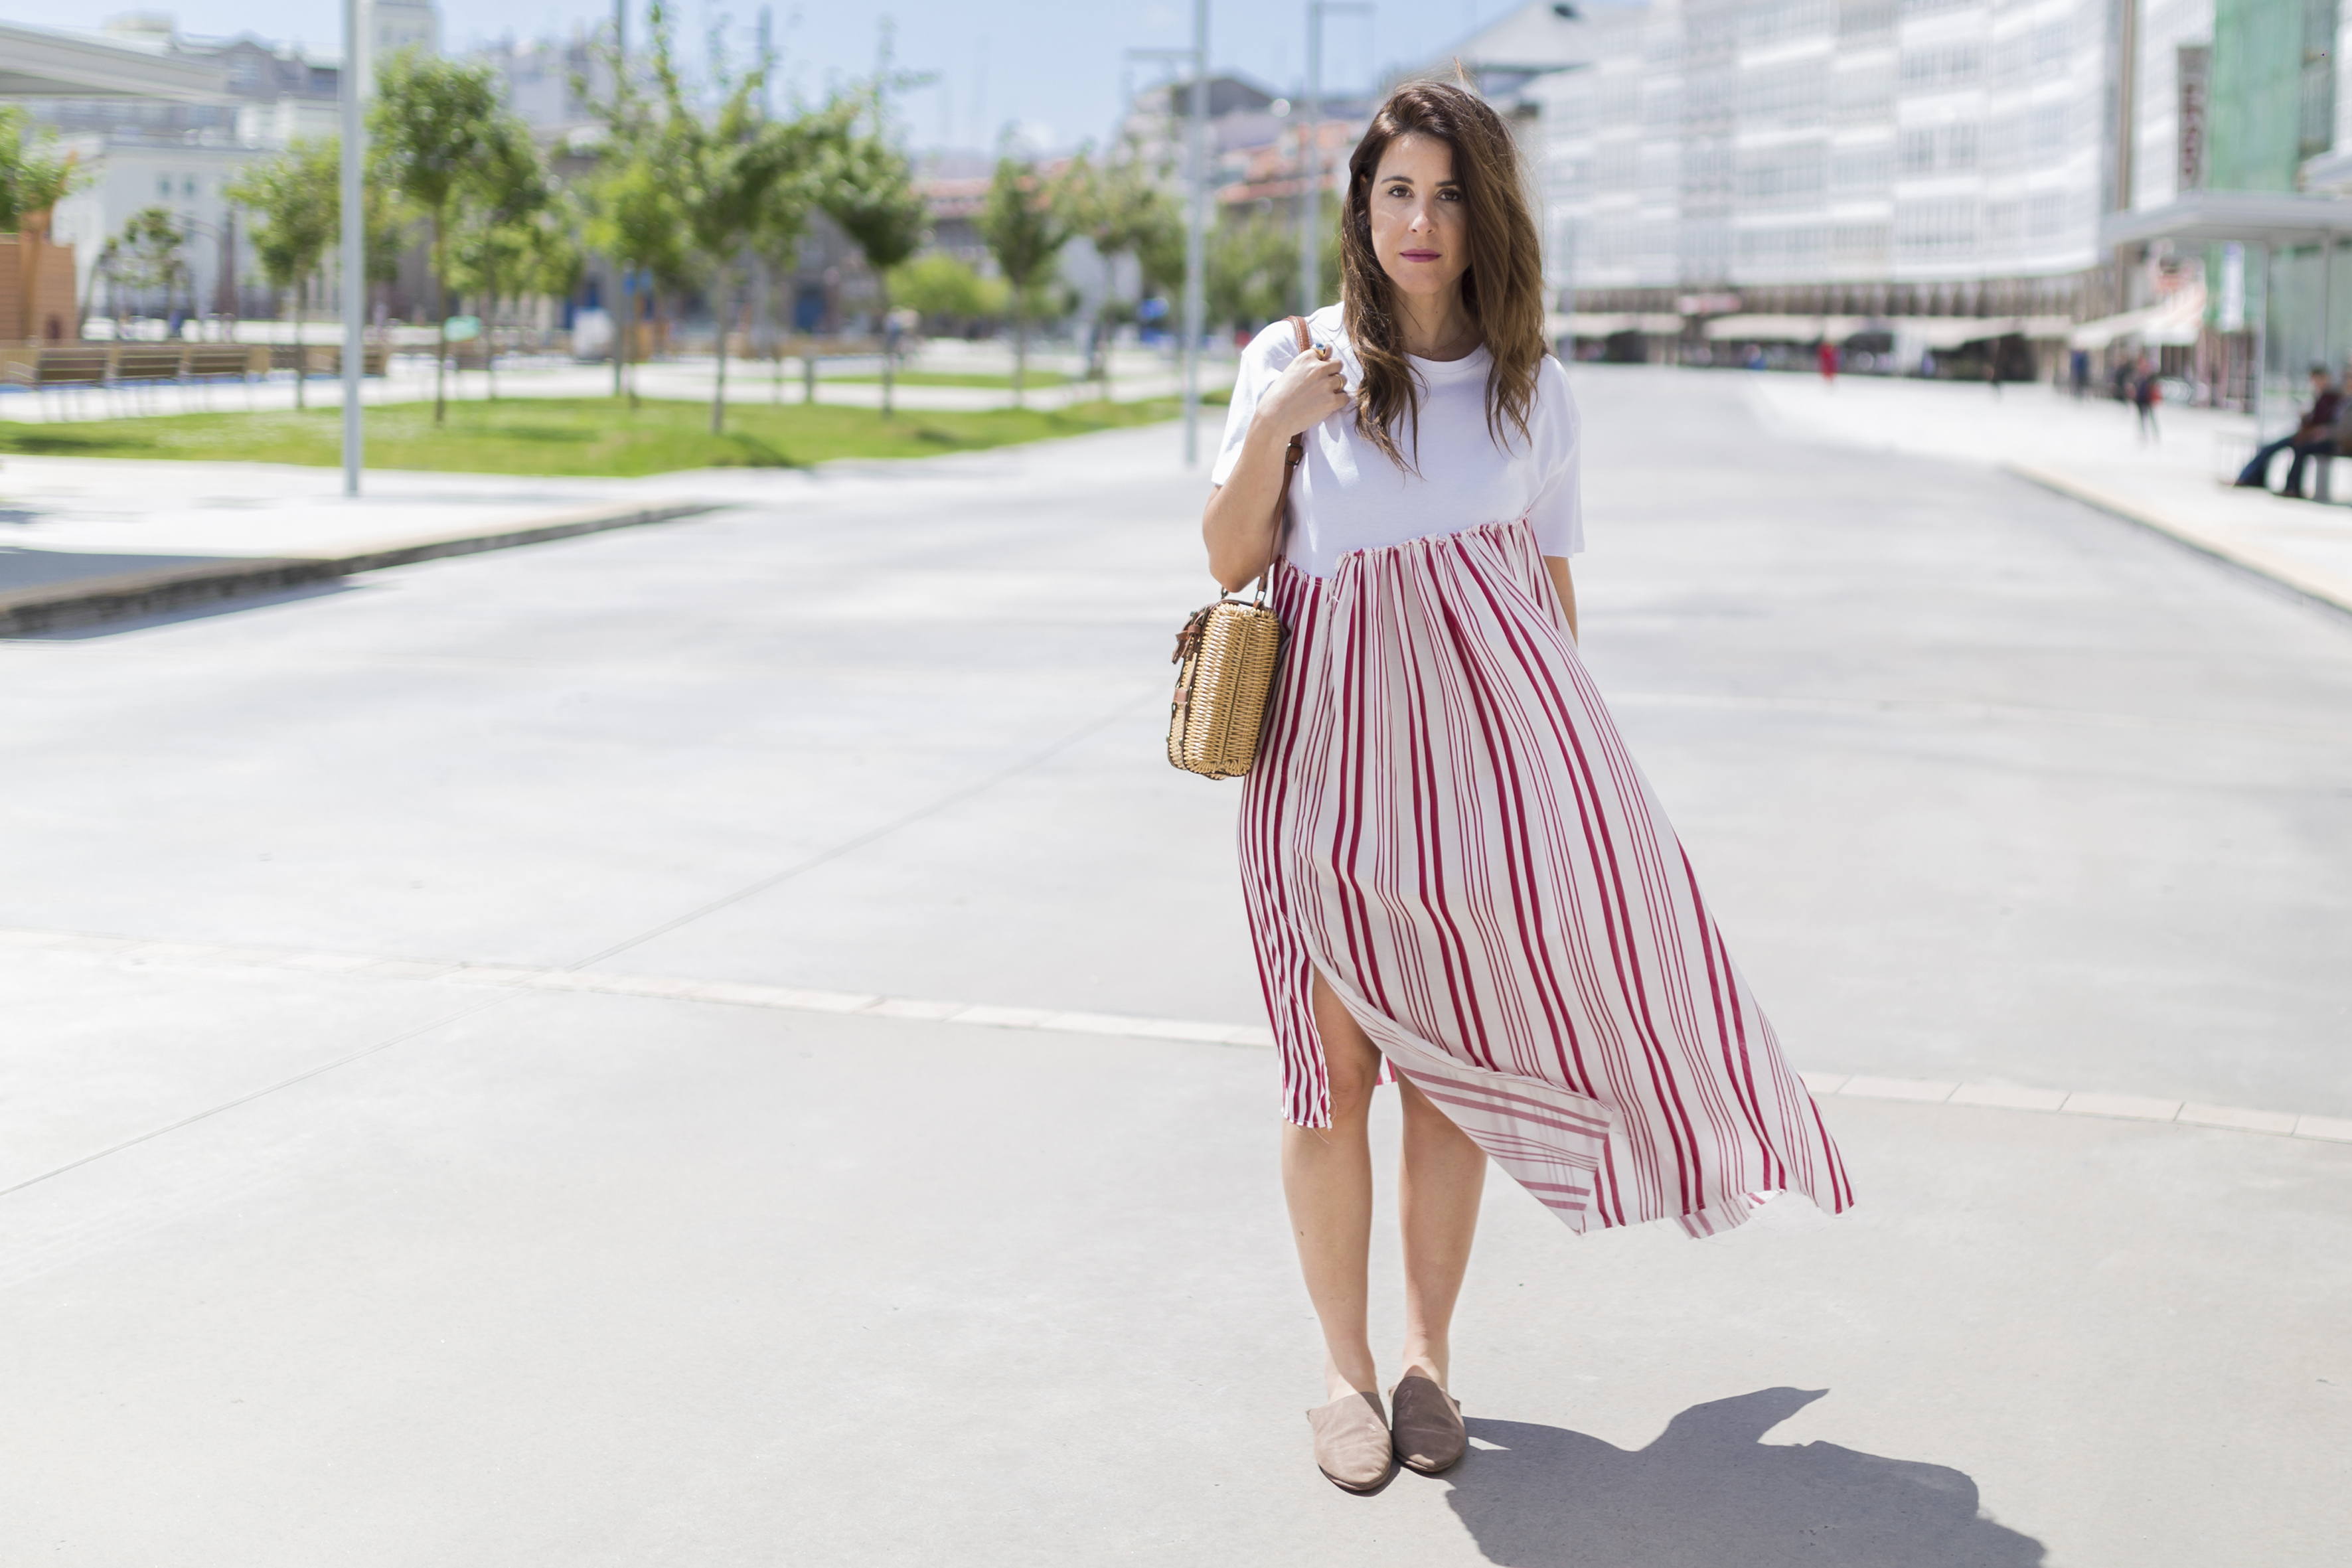 alba cuesta · babuchas · blogger · blanco · descalza look · estilista · fashion · marruecos · outfit · rayas · street style · zara-look